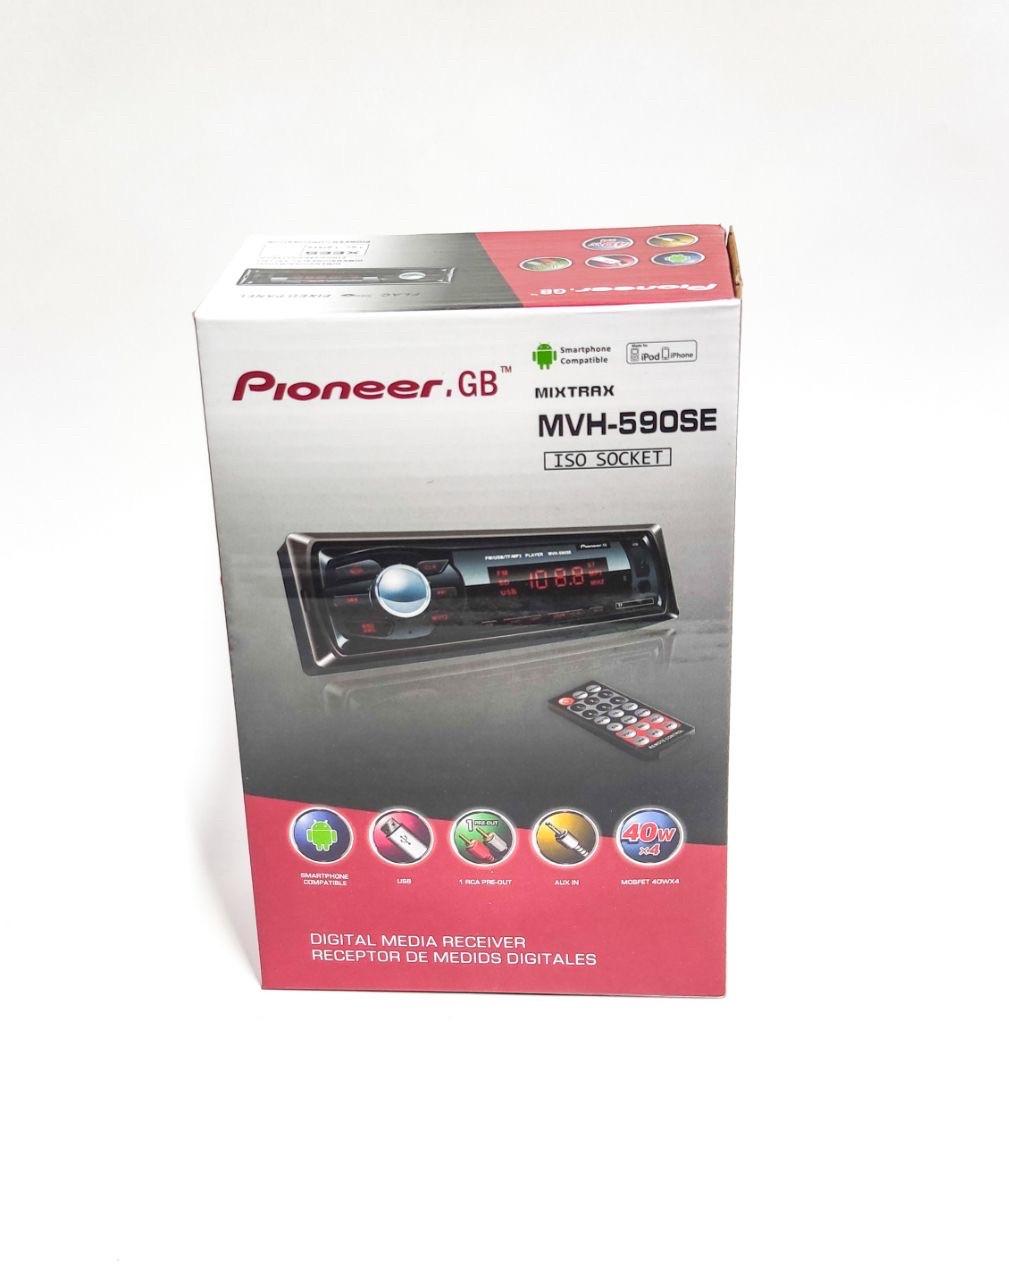 Автомобильный магнитола Pioneer.GB MVH-590 S E